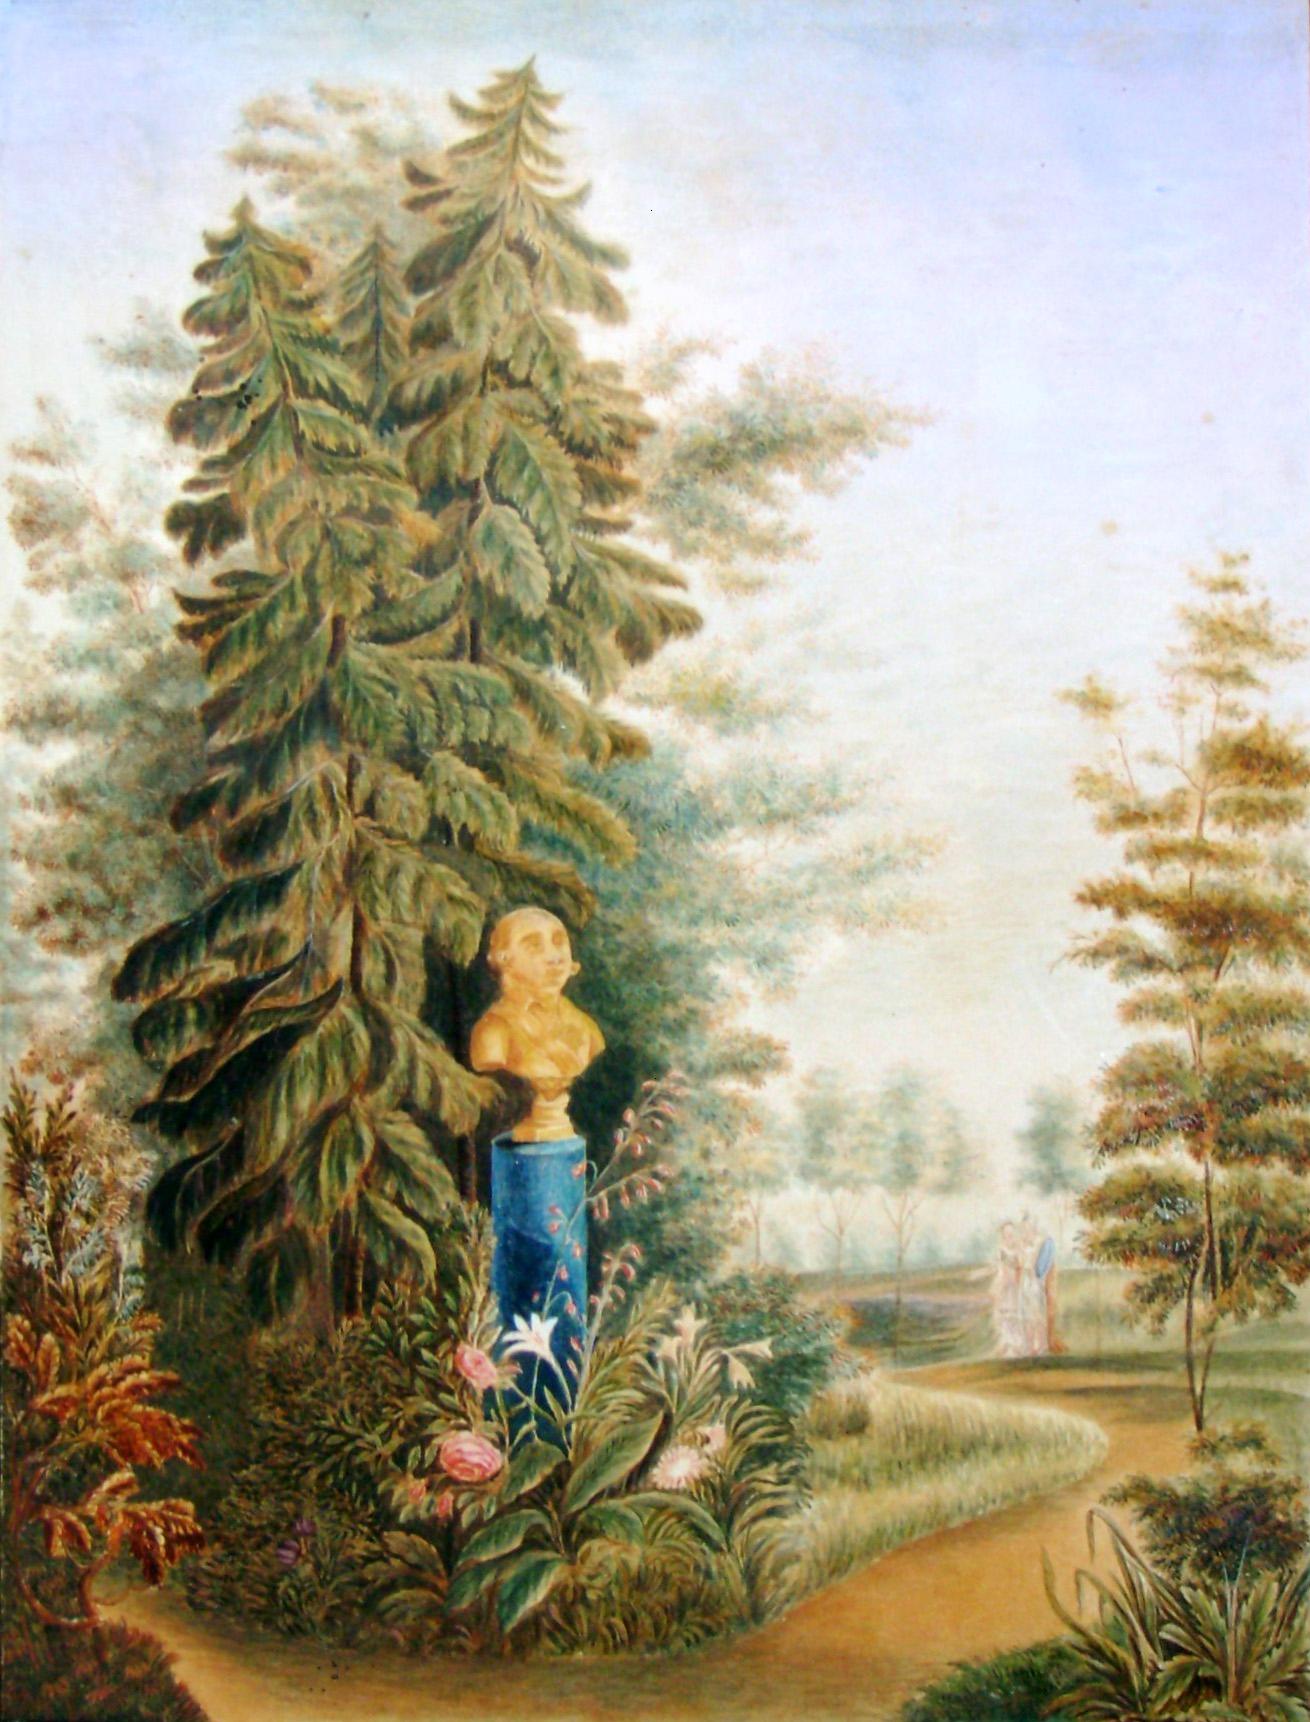 25. Бюст Императора Павла I-го в саду. Рисовал на камне Е. М. Павловский в 1823